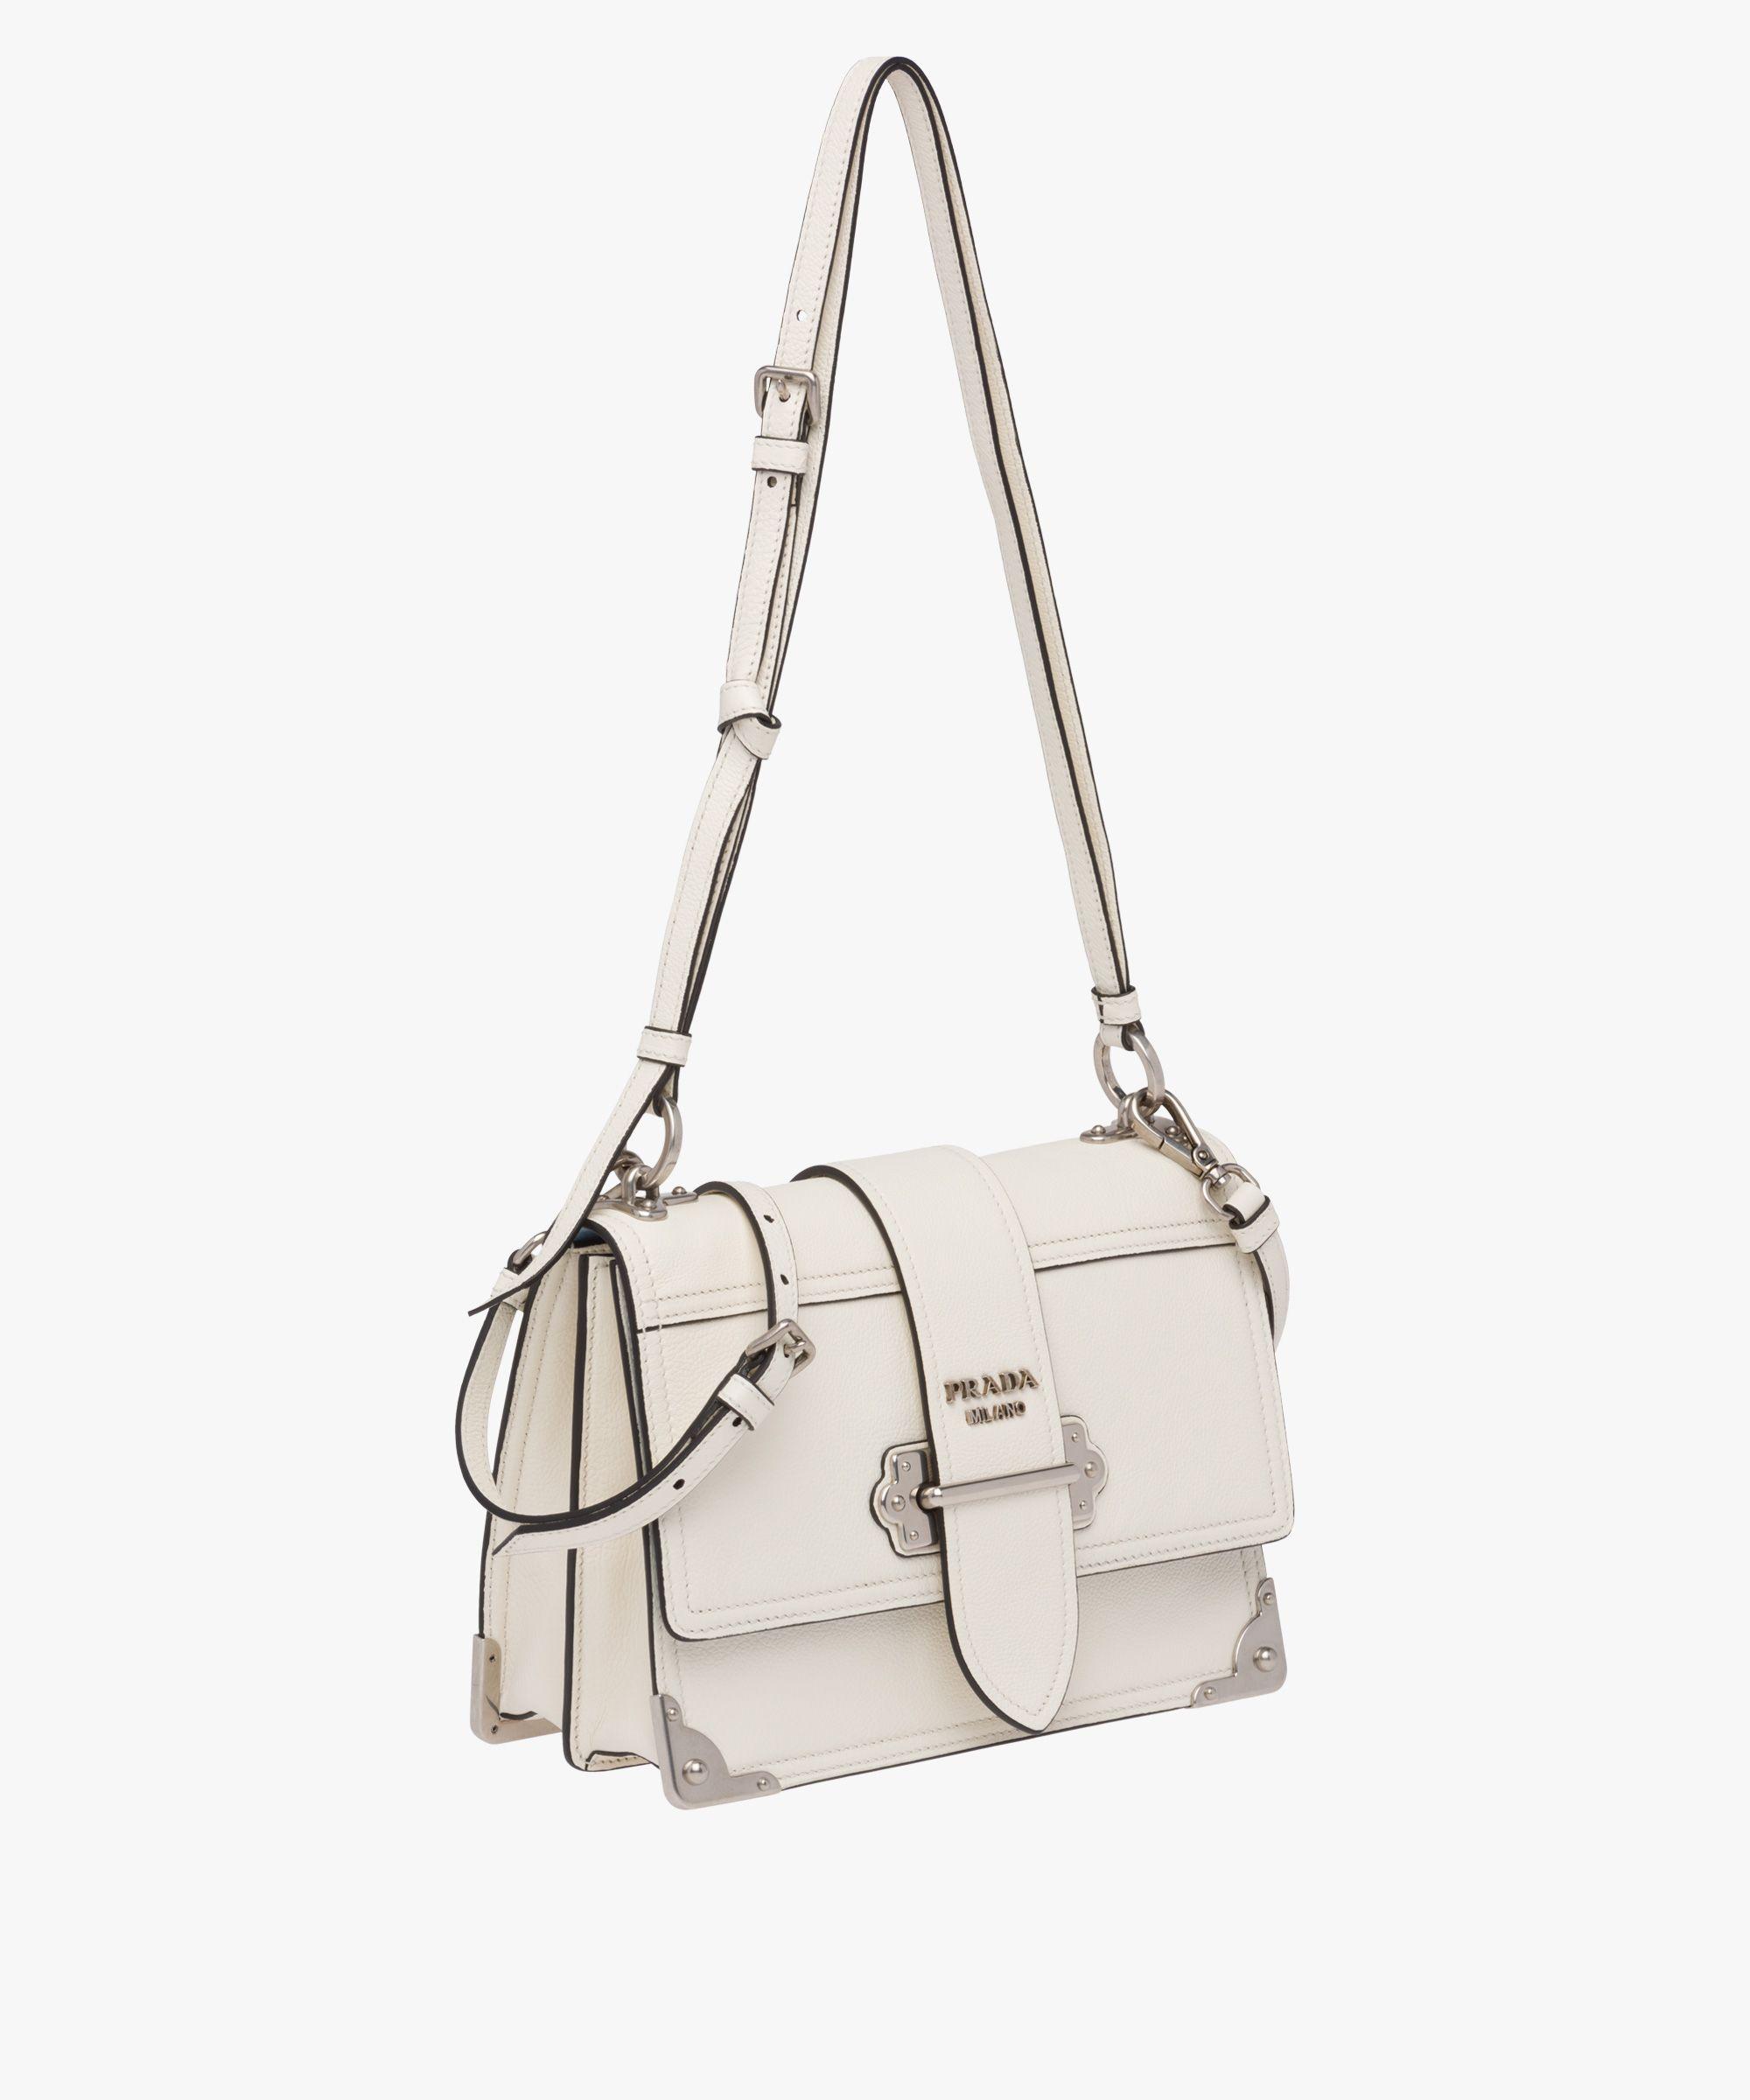 f4b10b6c43f3 Prada - Cahier white leather shoulder bag